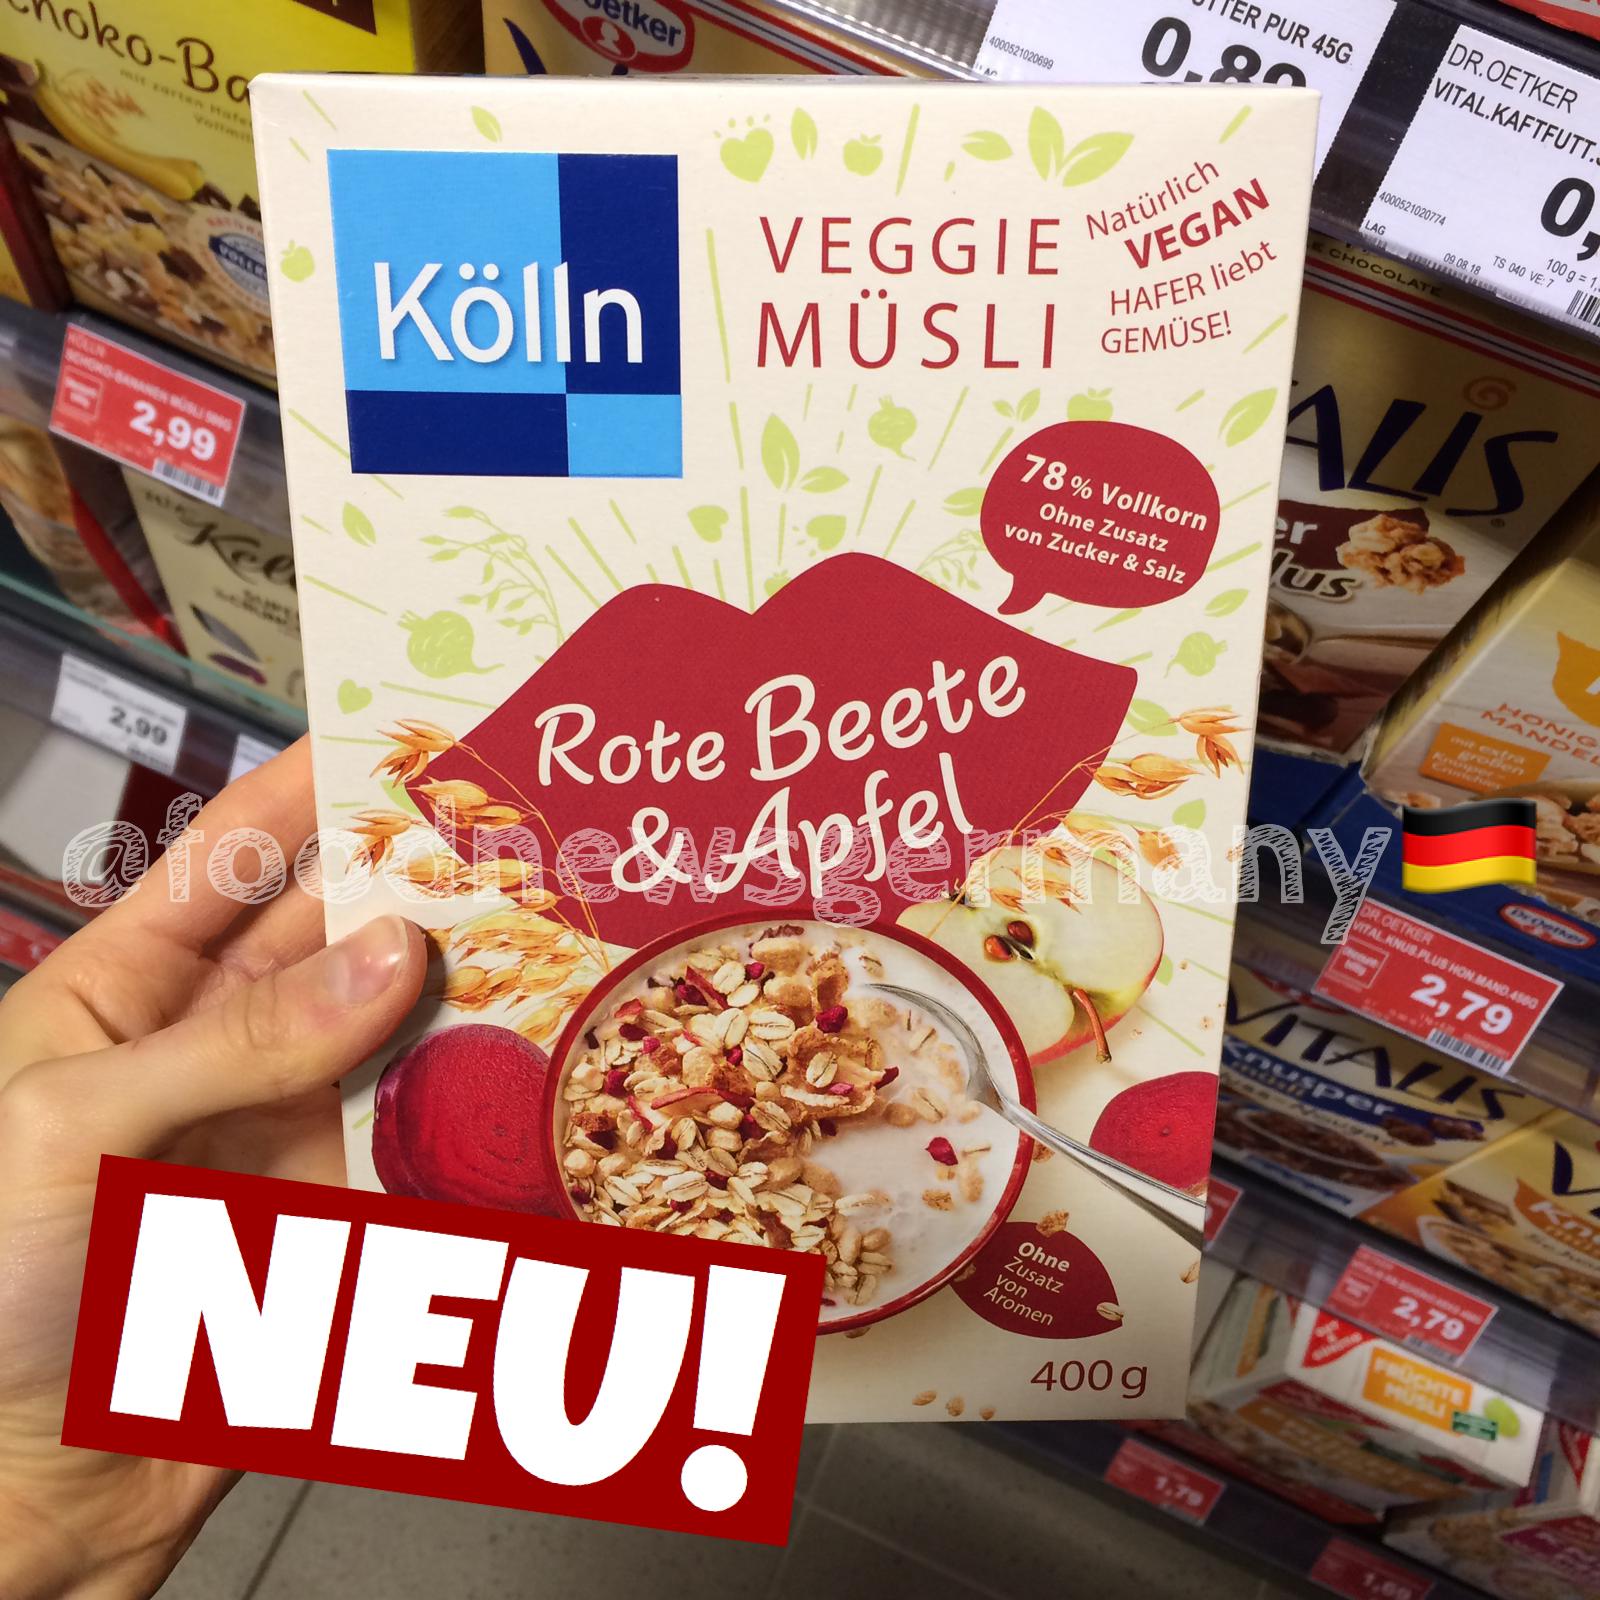 Kölln Veggie Müsli Rote Beete & Apfel